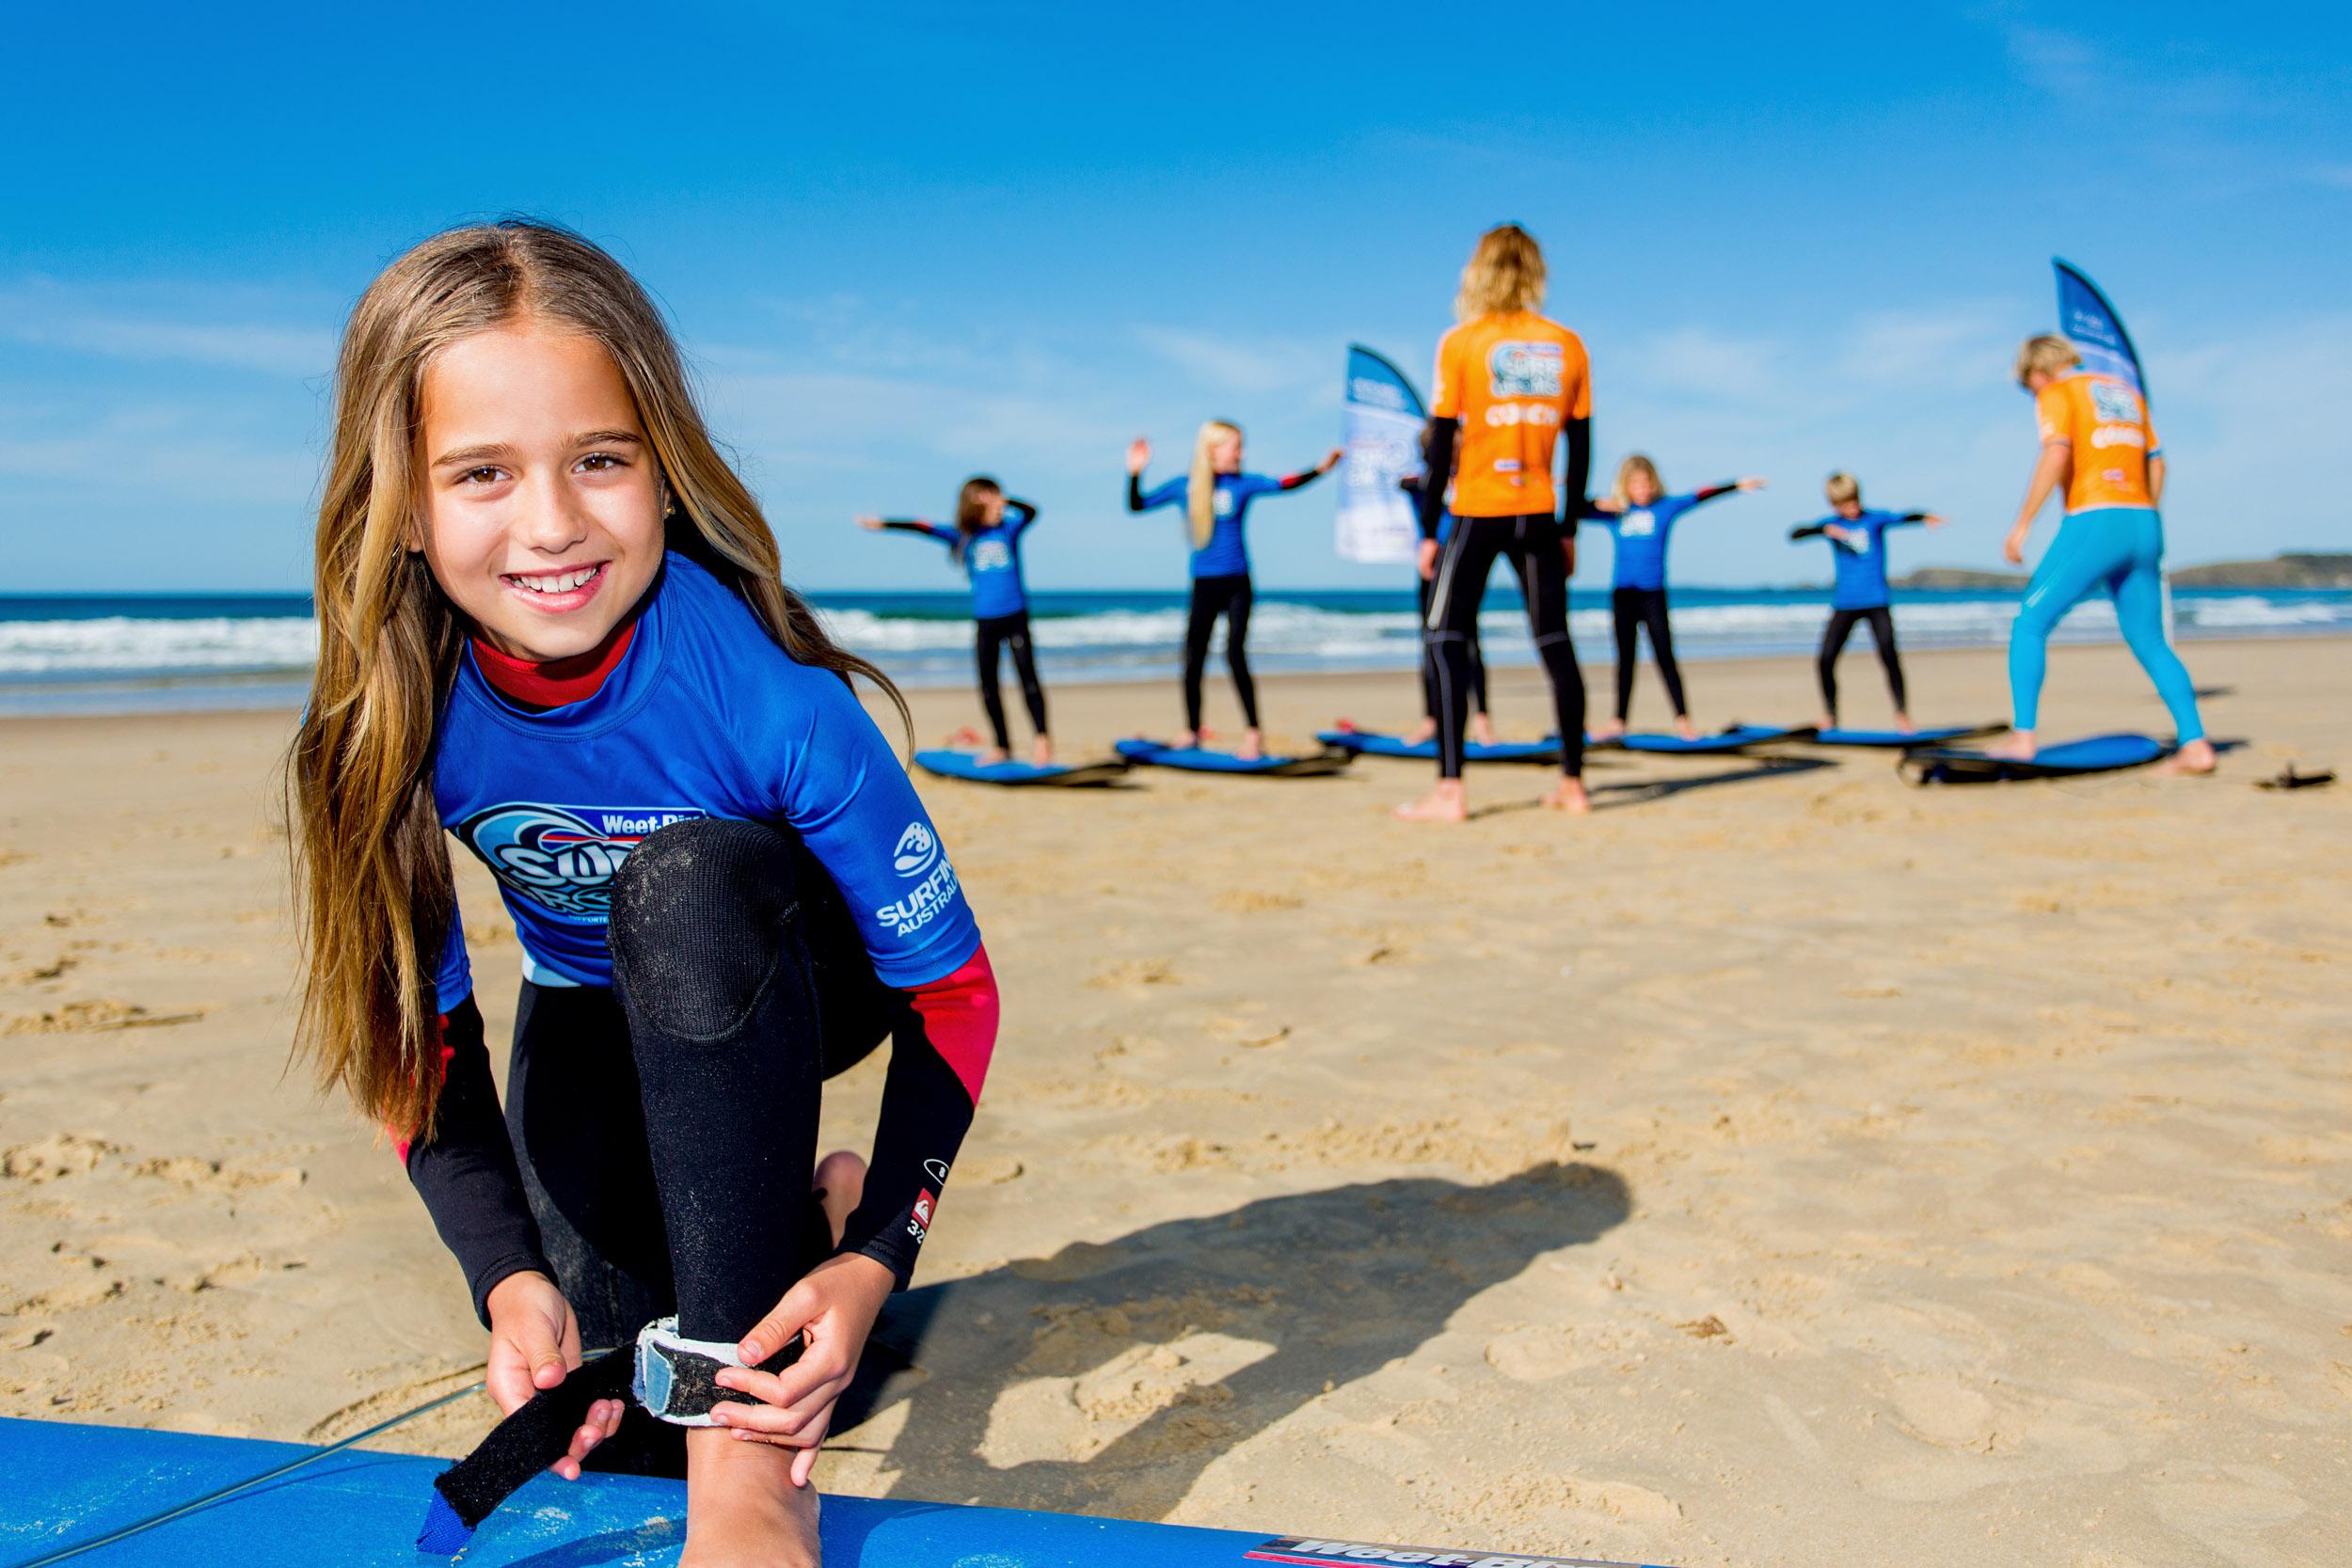 surfing-australia-surf-groms-photography-SGWB-148.jpg